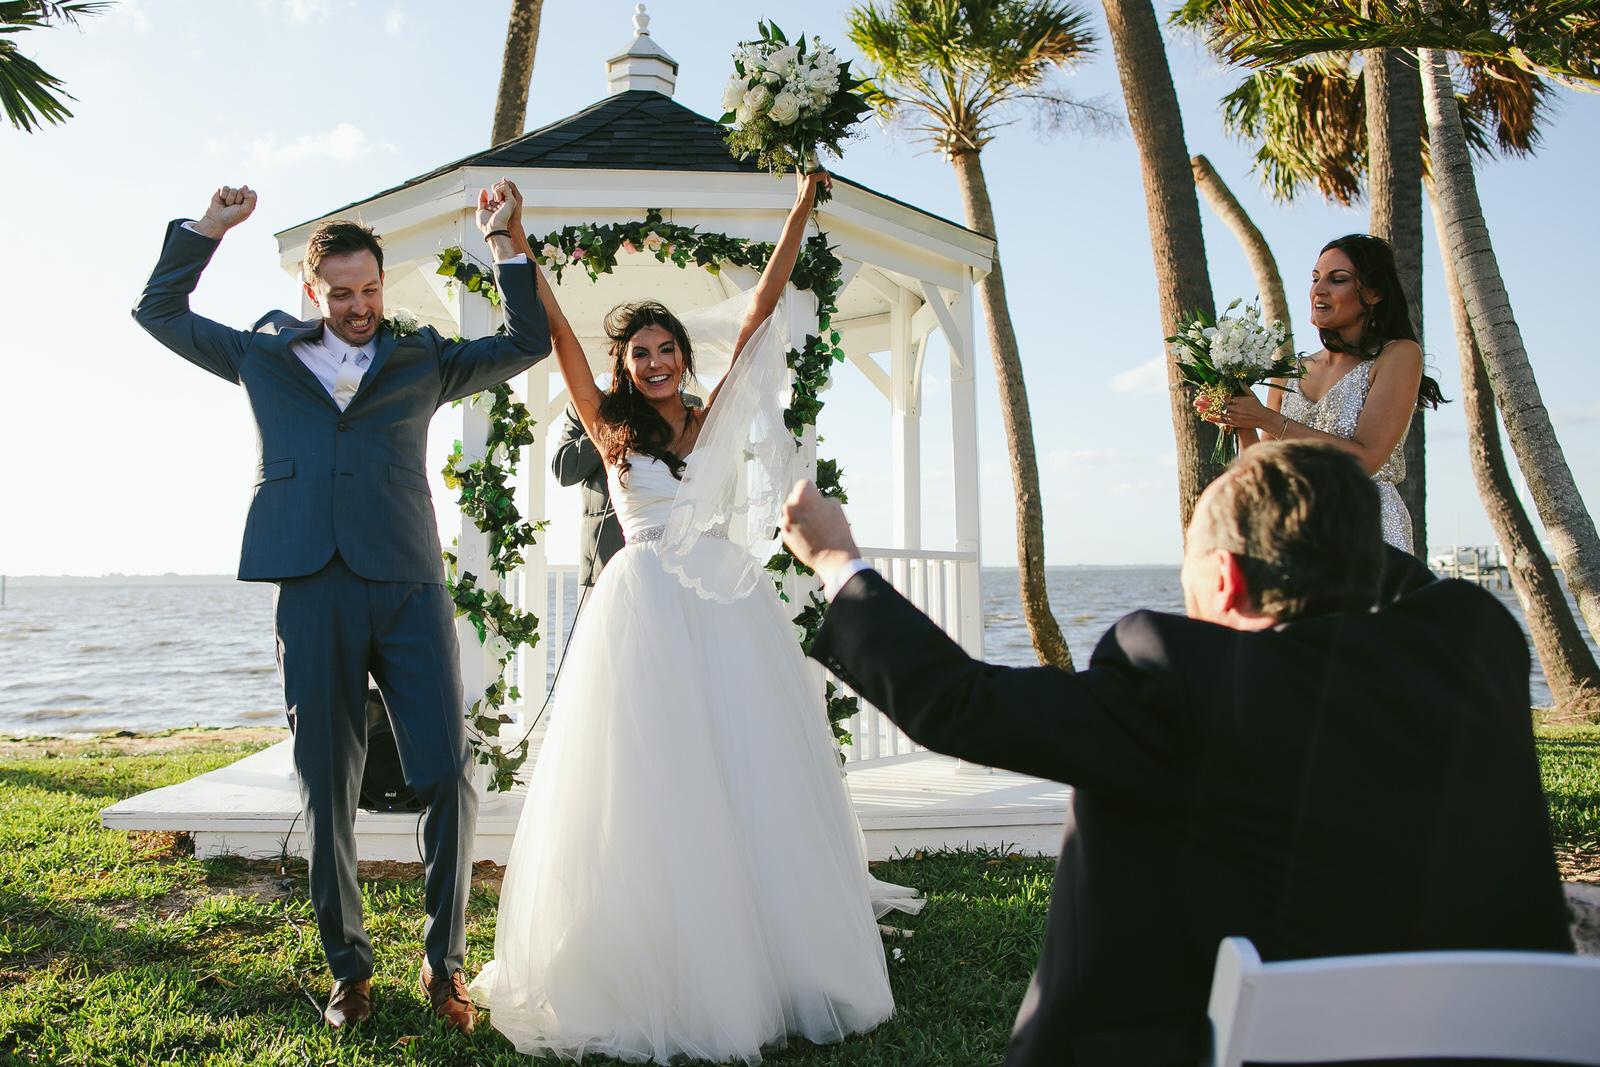 jensen_beach_wedding_ceremony-146.jpg